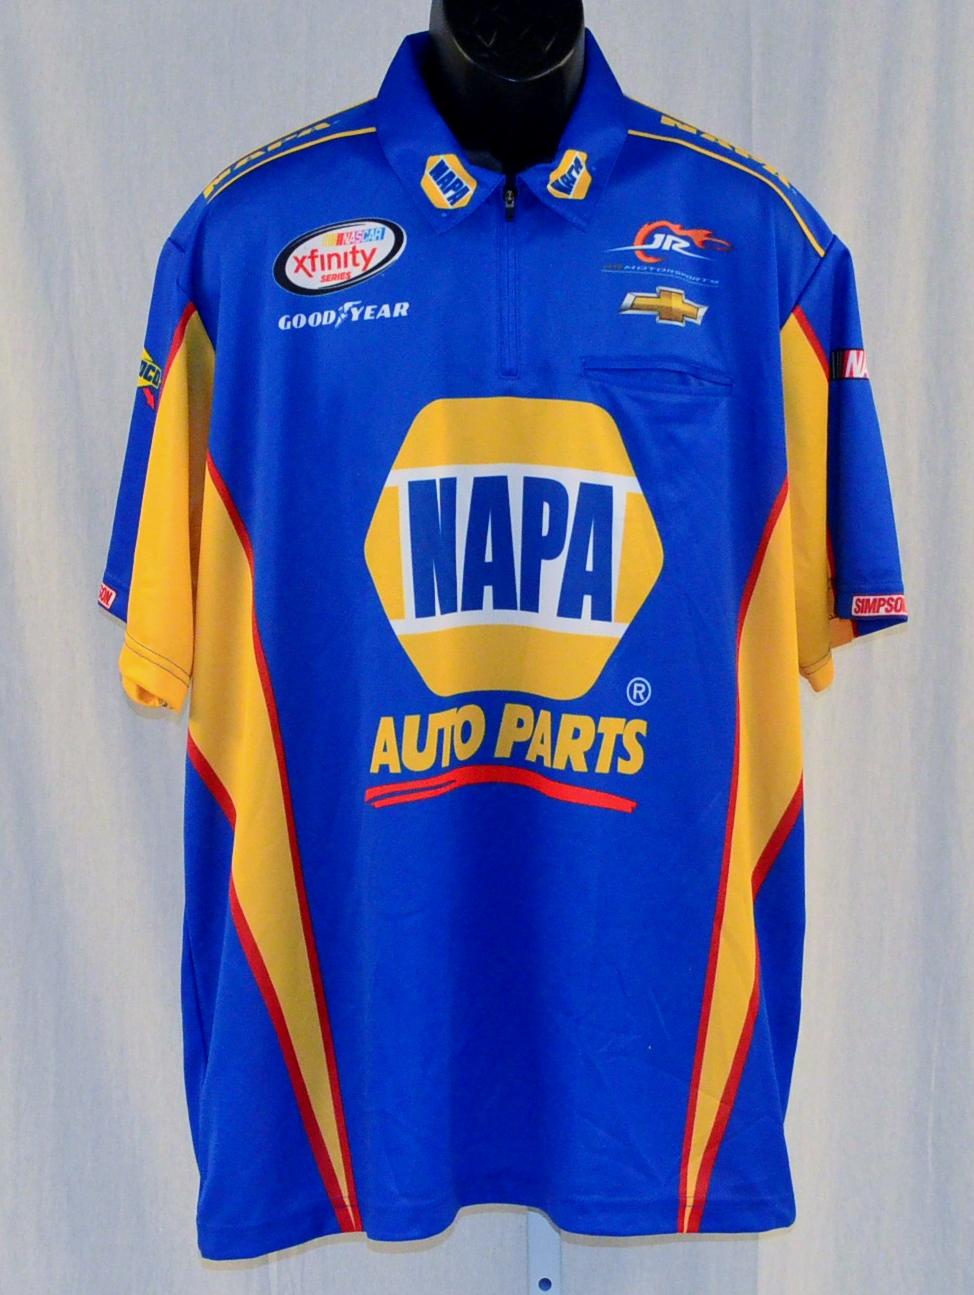 2015 Chase Elliott NAPA Jr Motorsports NEW!! NASCAR Pit Crew Shirt: https://www.raceimage.com/2015-Chase-Elliott-NAPA-Jr-Motorsports...